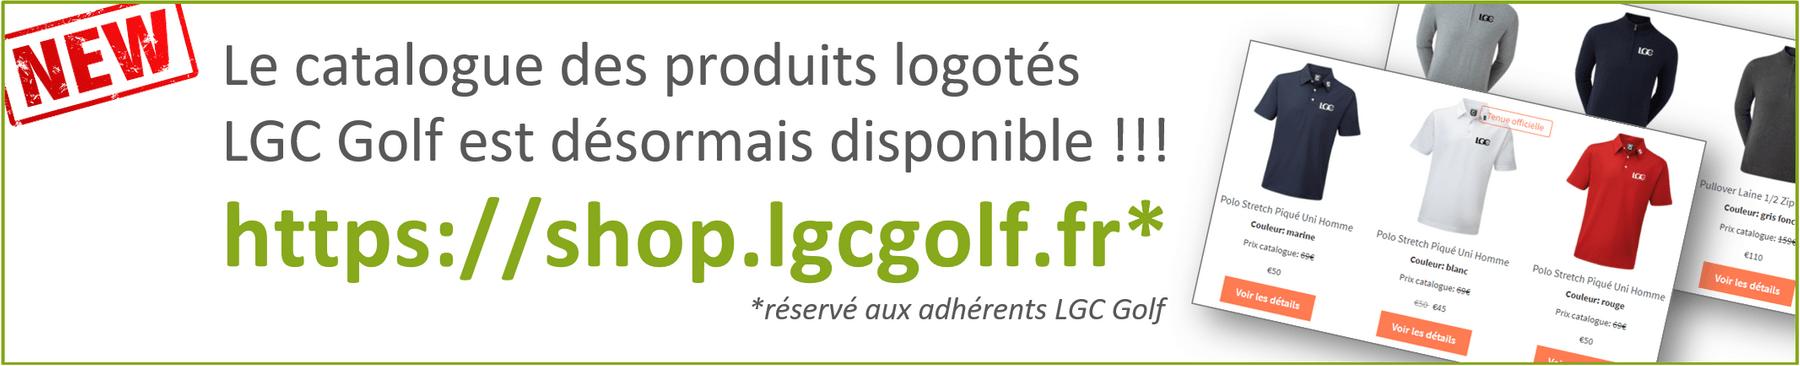 Catalogue LGC Golf